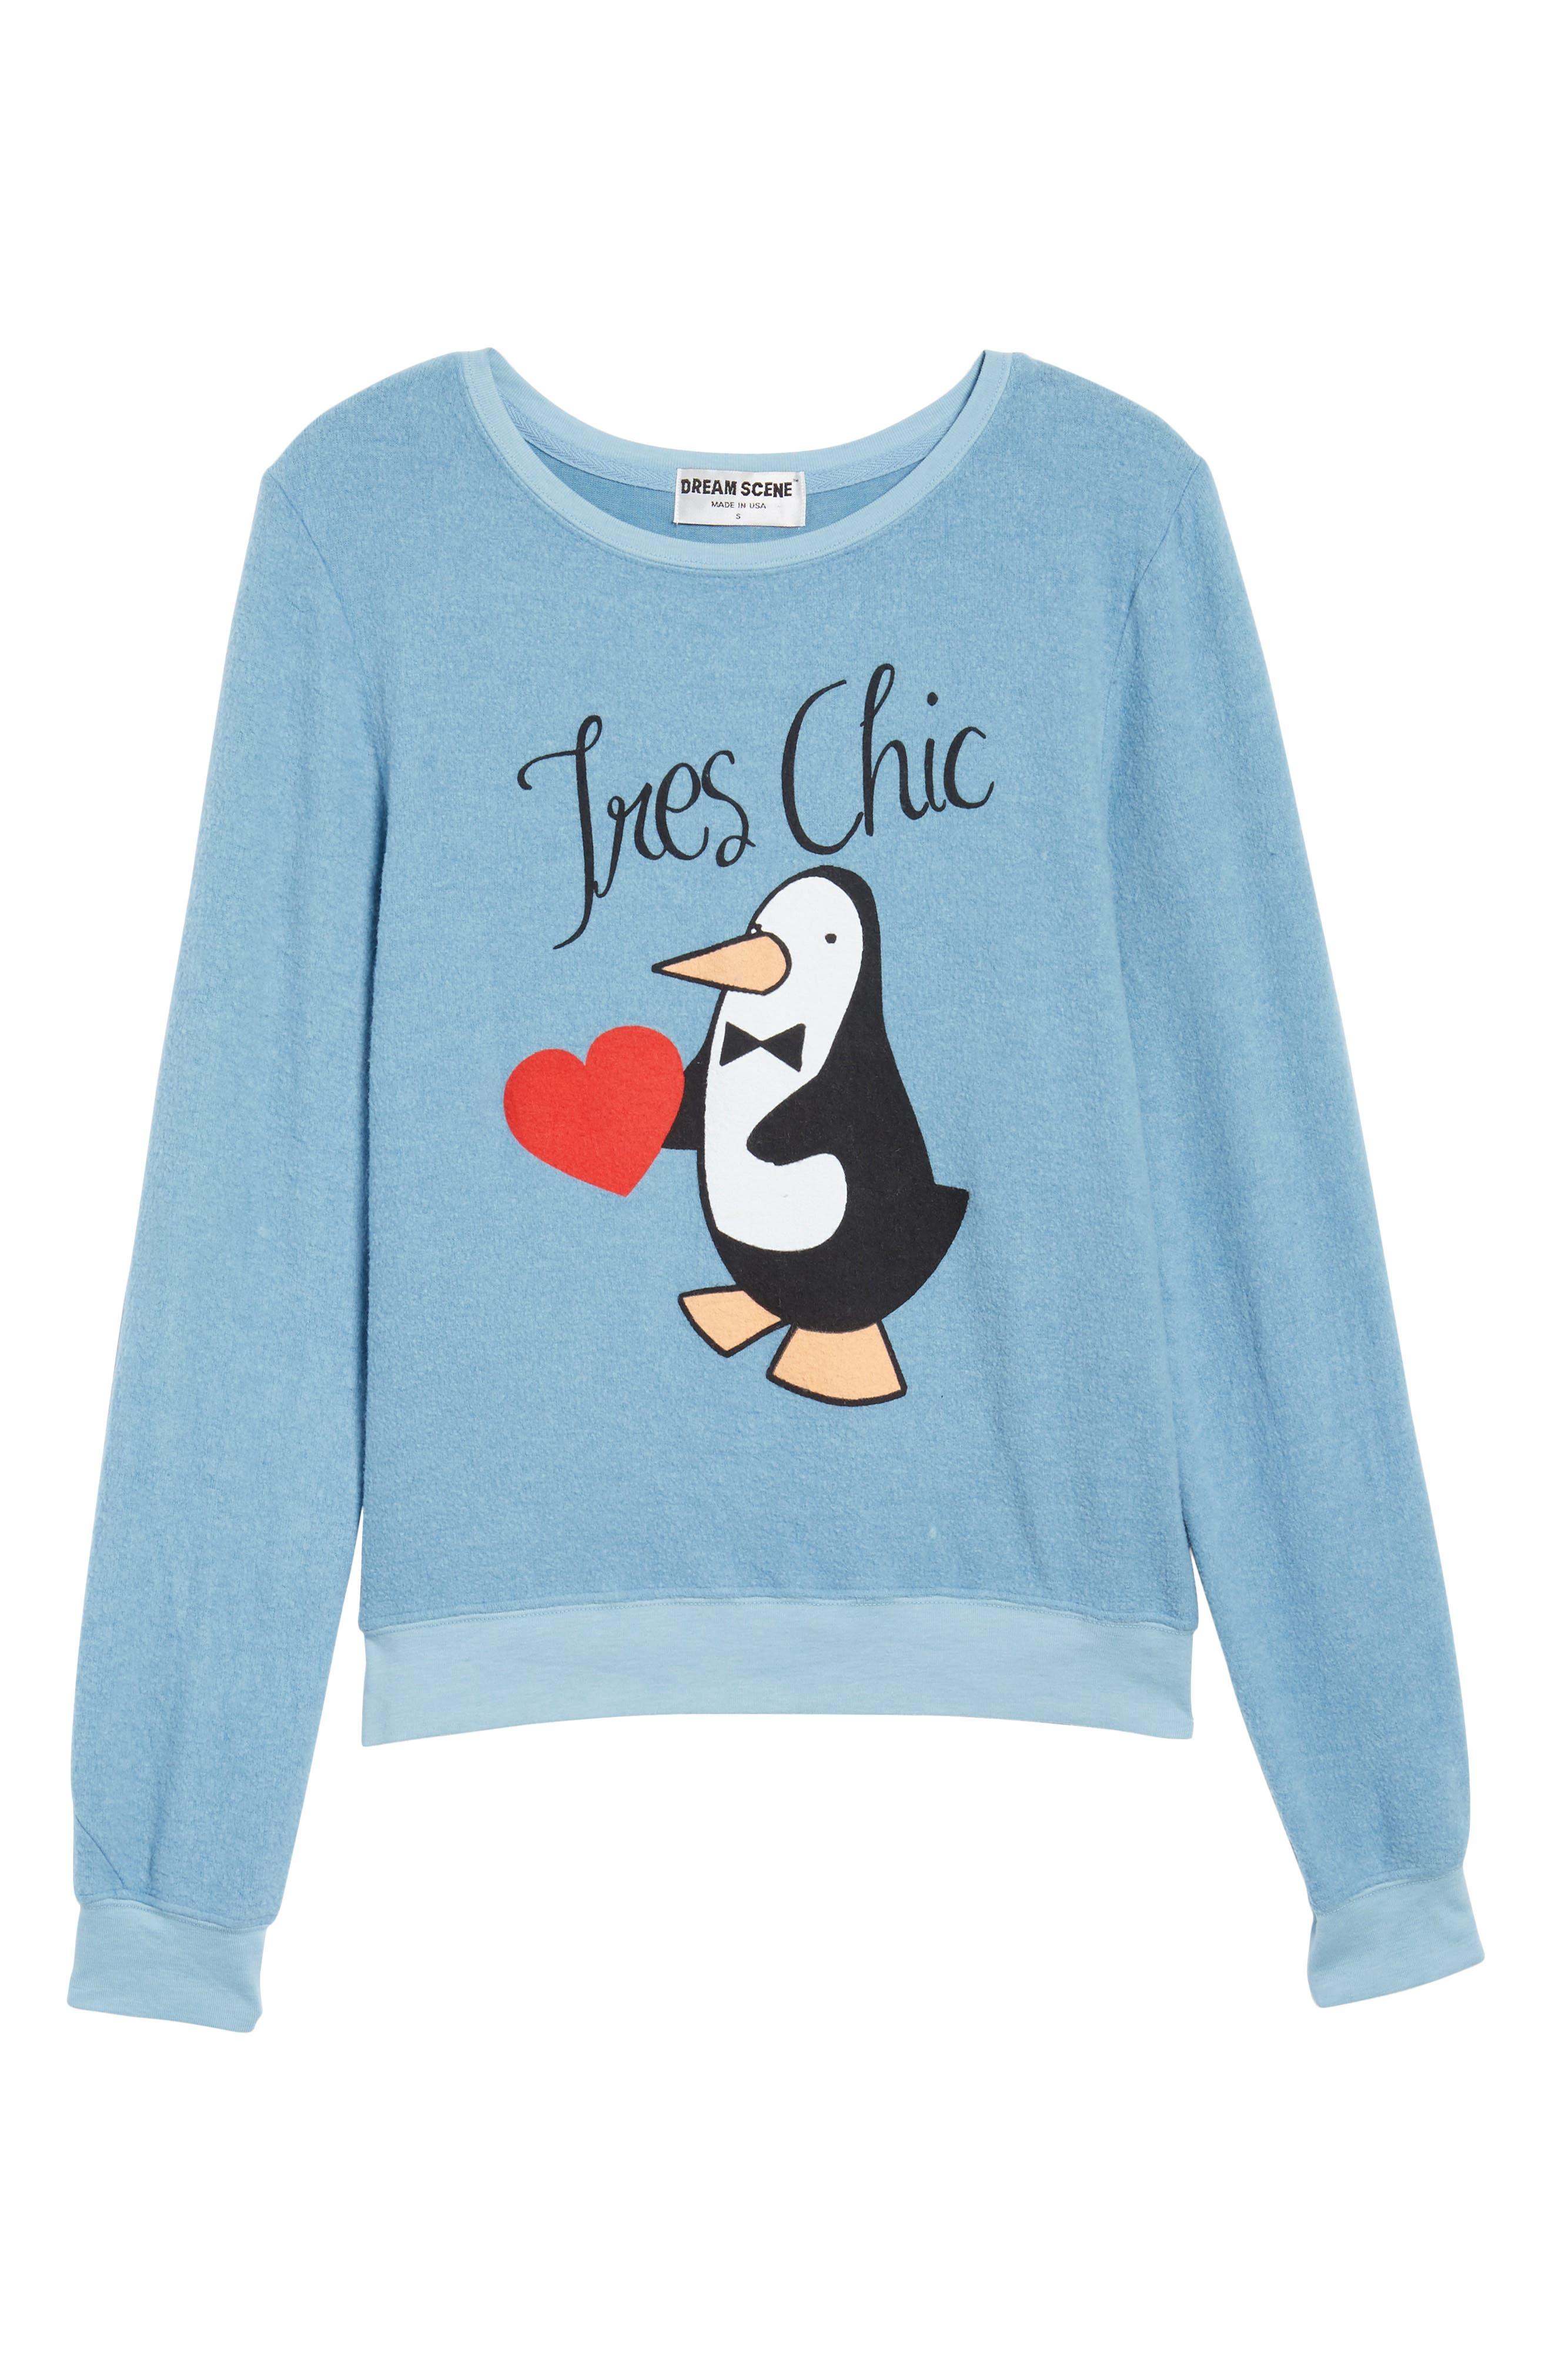 Très Chic Sweatshirt,                             Alternate thumbnail 6, color,                             Dahlia